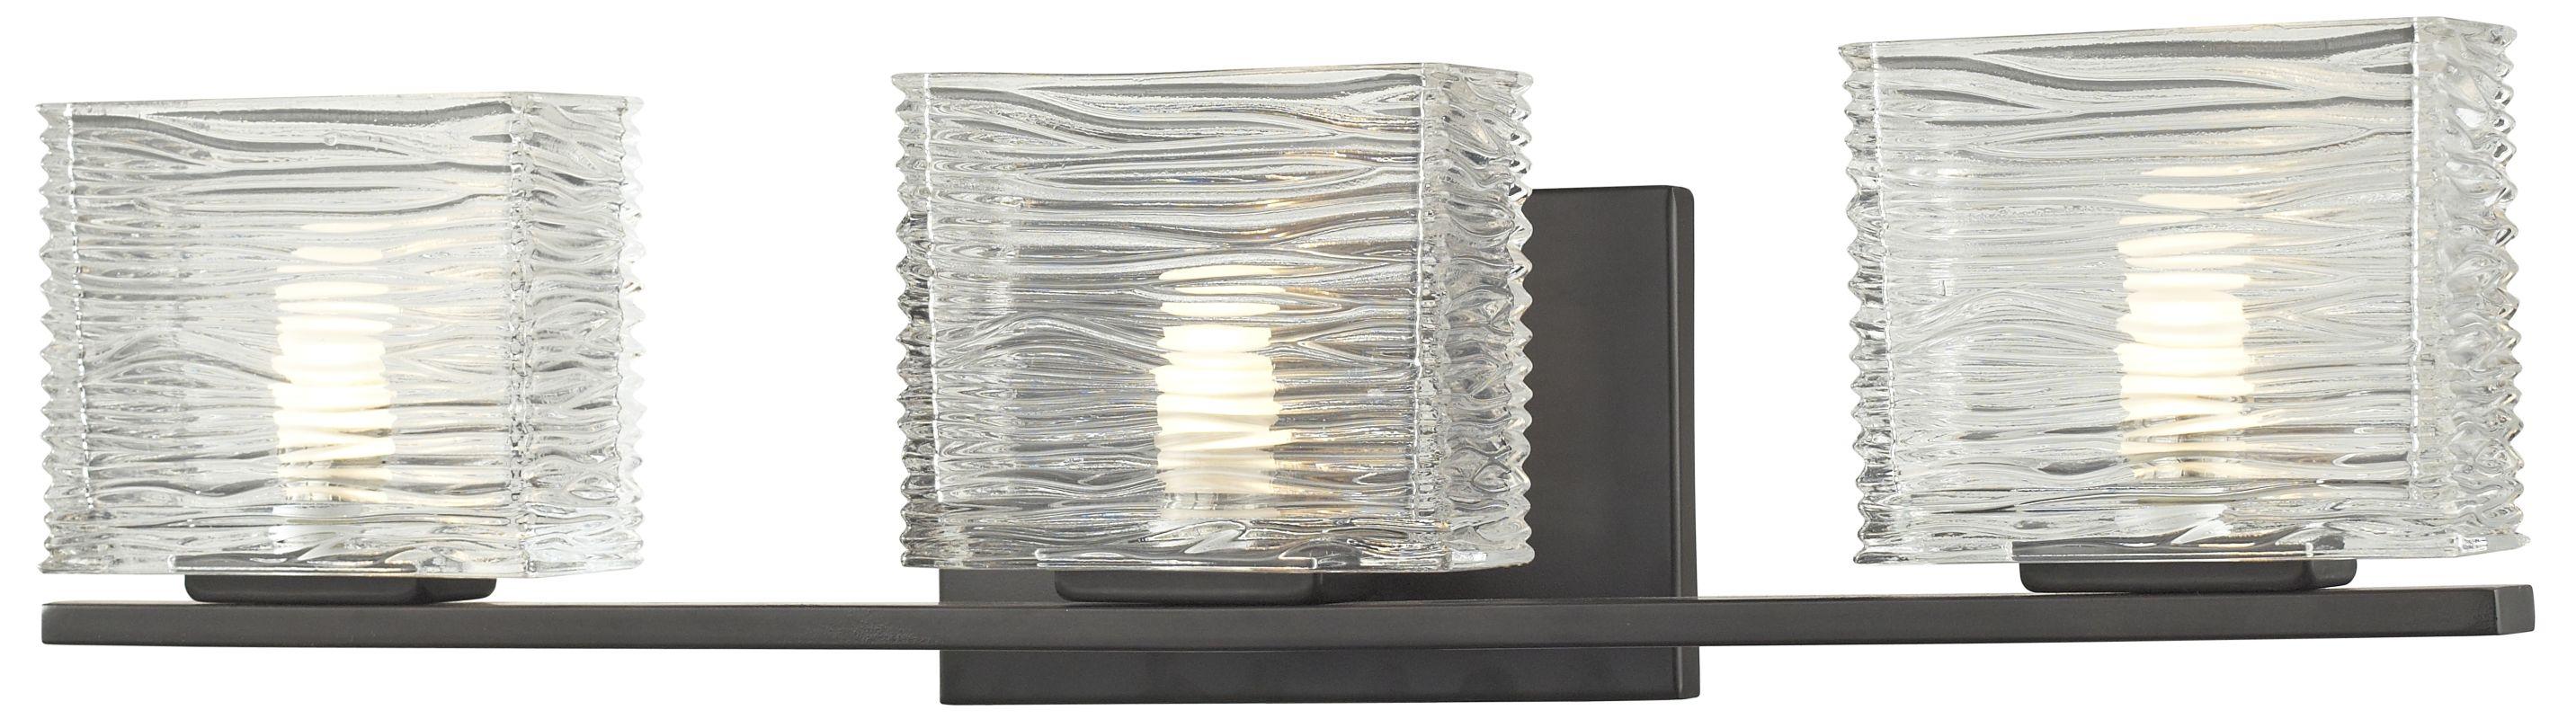 Z-Lite 3026-3V Jaol 3 Light ADA Compliant Bathroom Vanity Light with